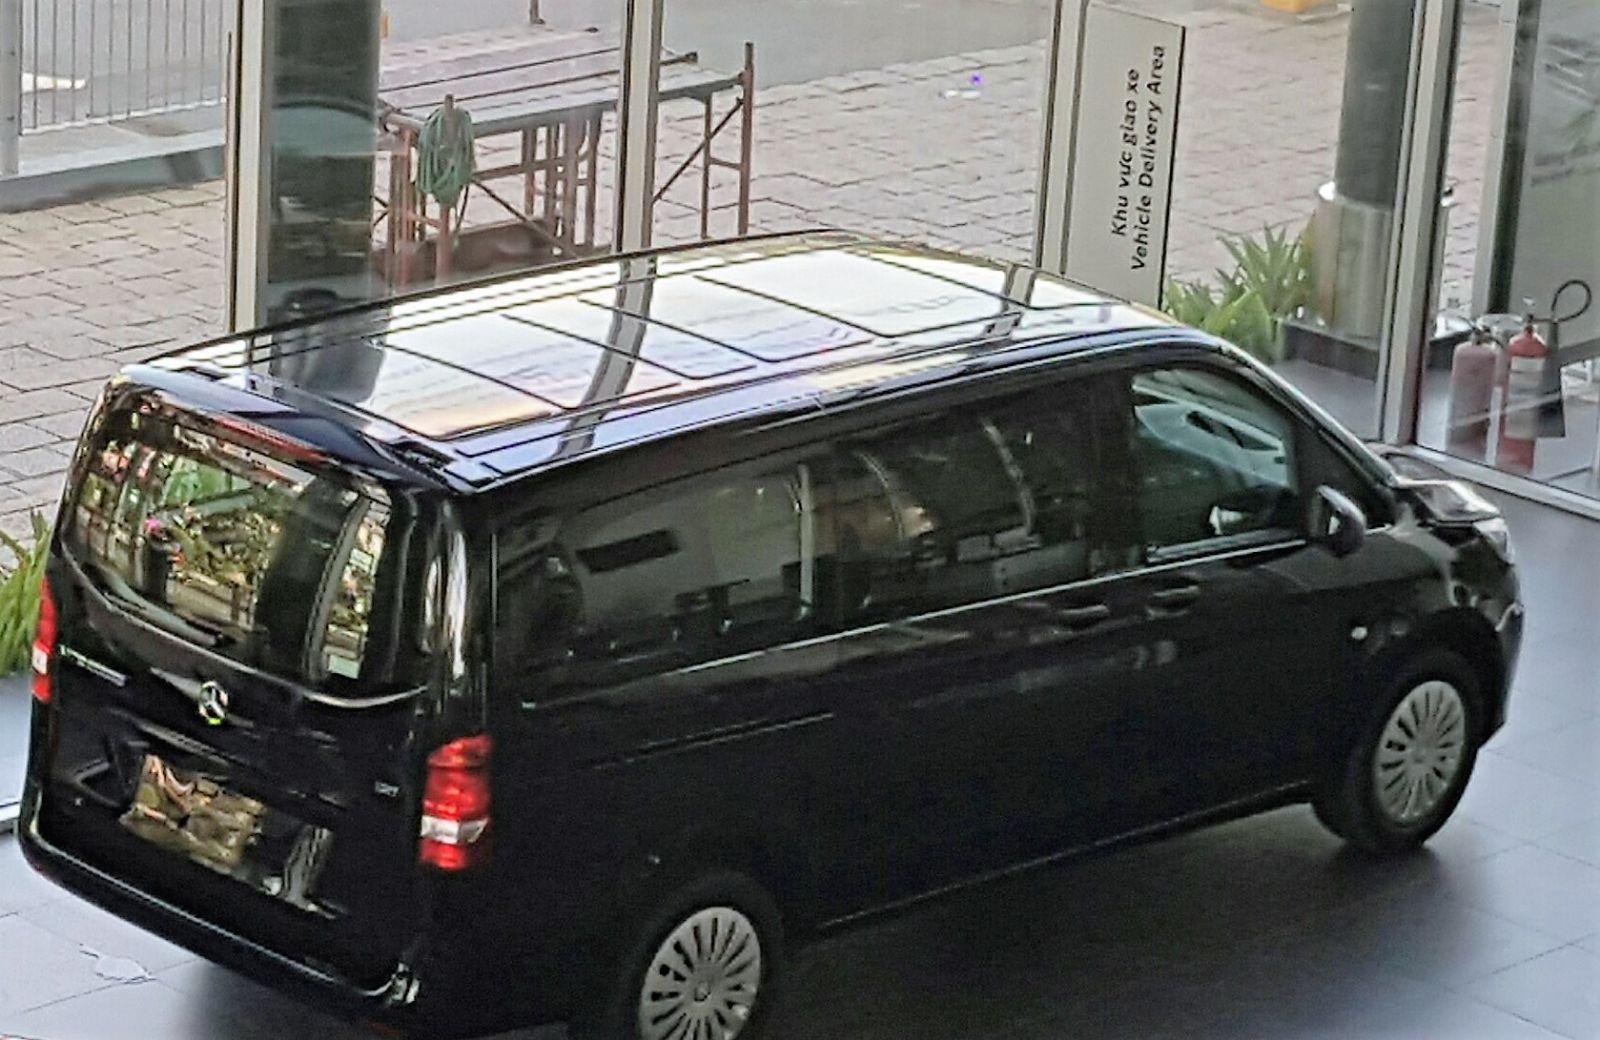 Ngoại thất Xe Mercedes Benz Vito Tourer 121 Máy Xăng màu đen 06